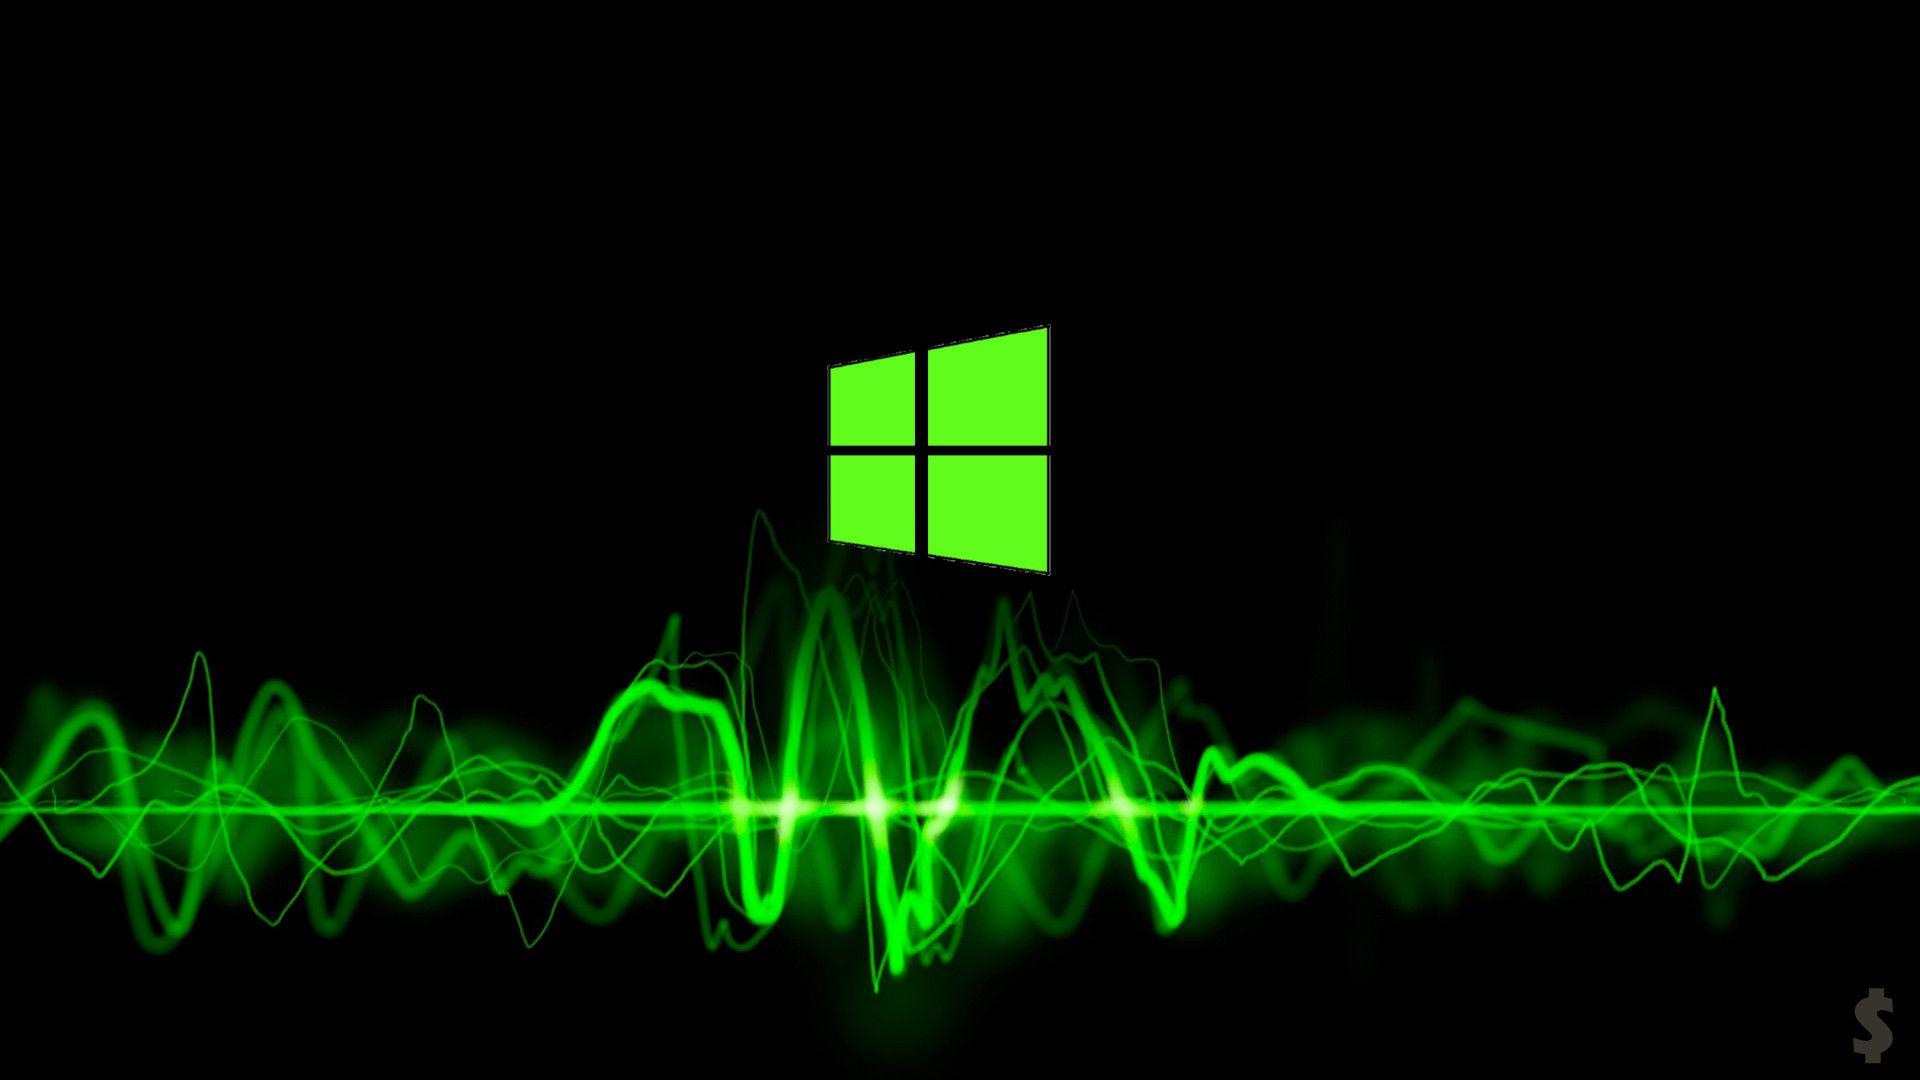 Res 1920x1080 Best Green Windows 10 Wallpaper Hd 19329 Wallpaper Download Hd Neon Wallpaper Phone Wallpaper Images Green Wallpaper Phone